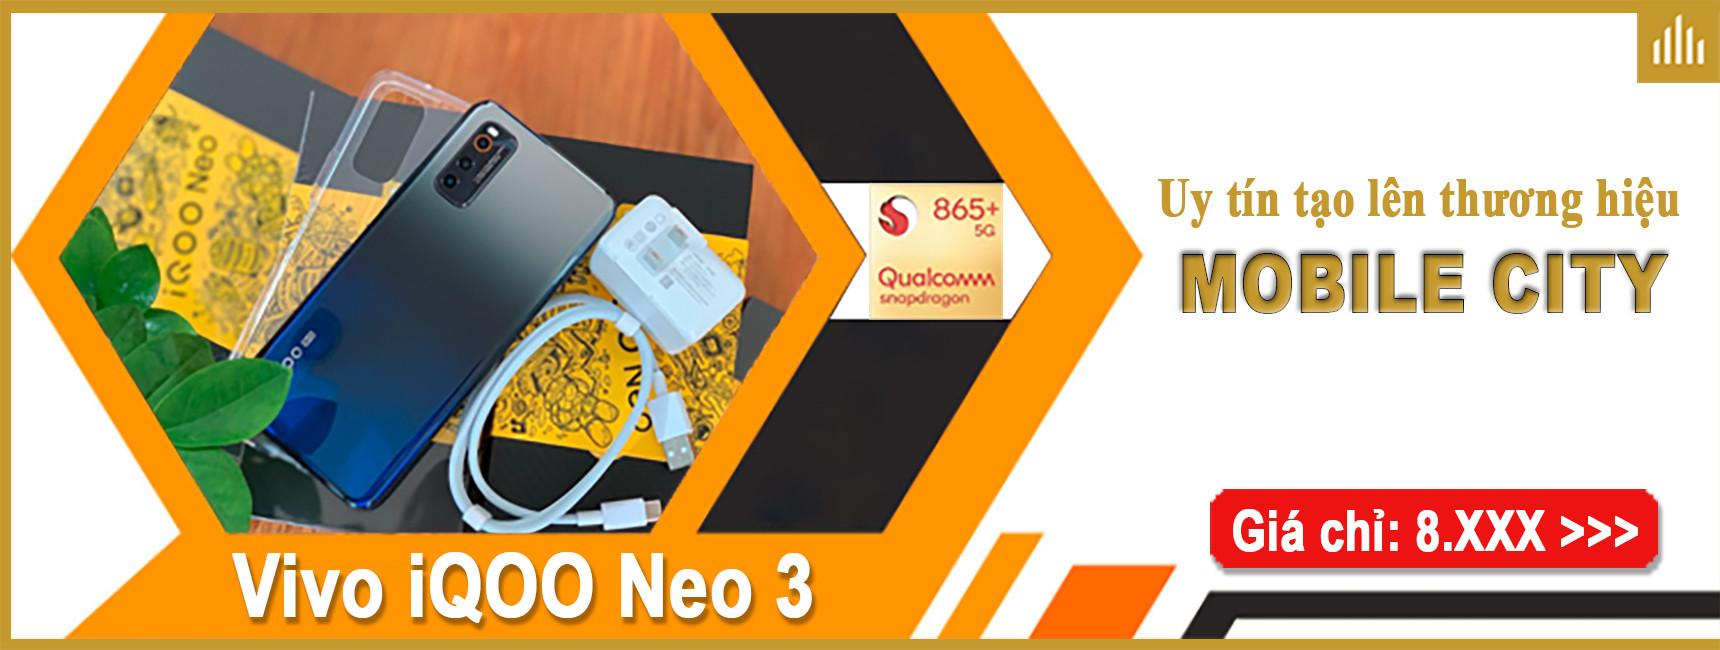 Vivo iQOO Neo 3 Mobilecity